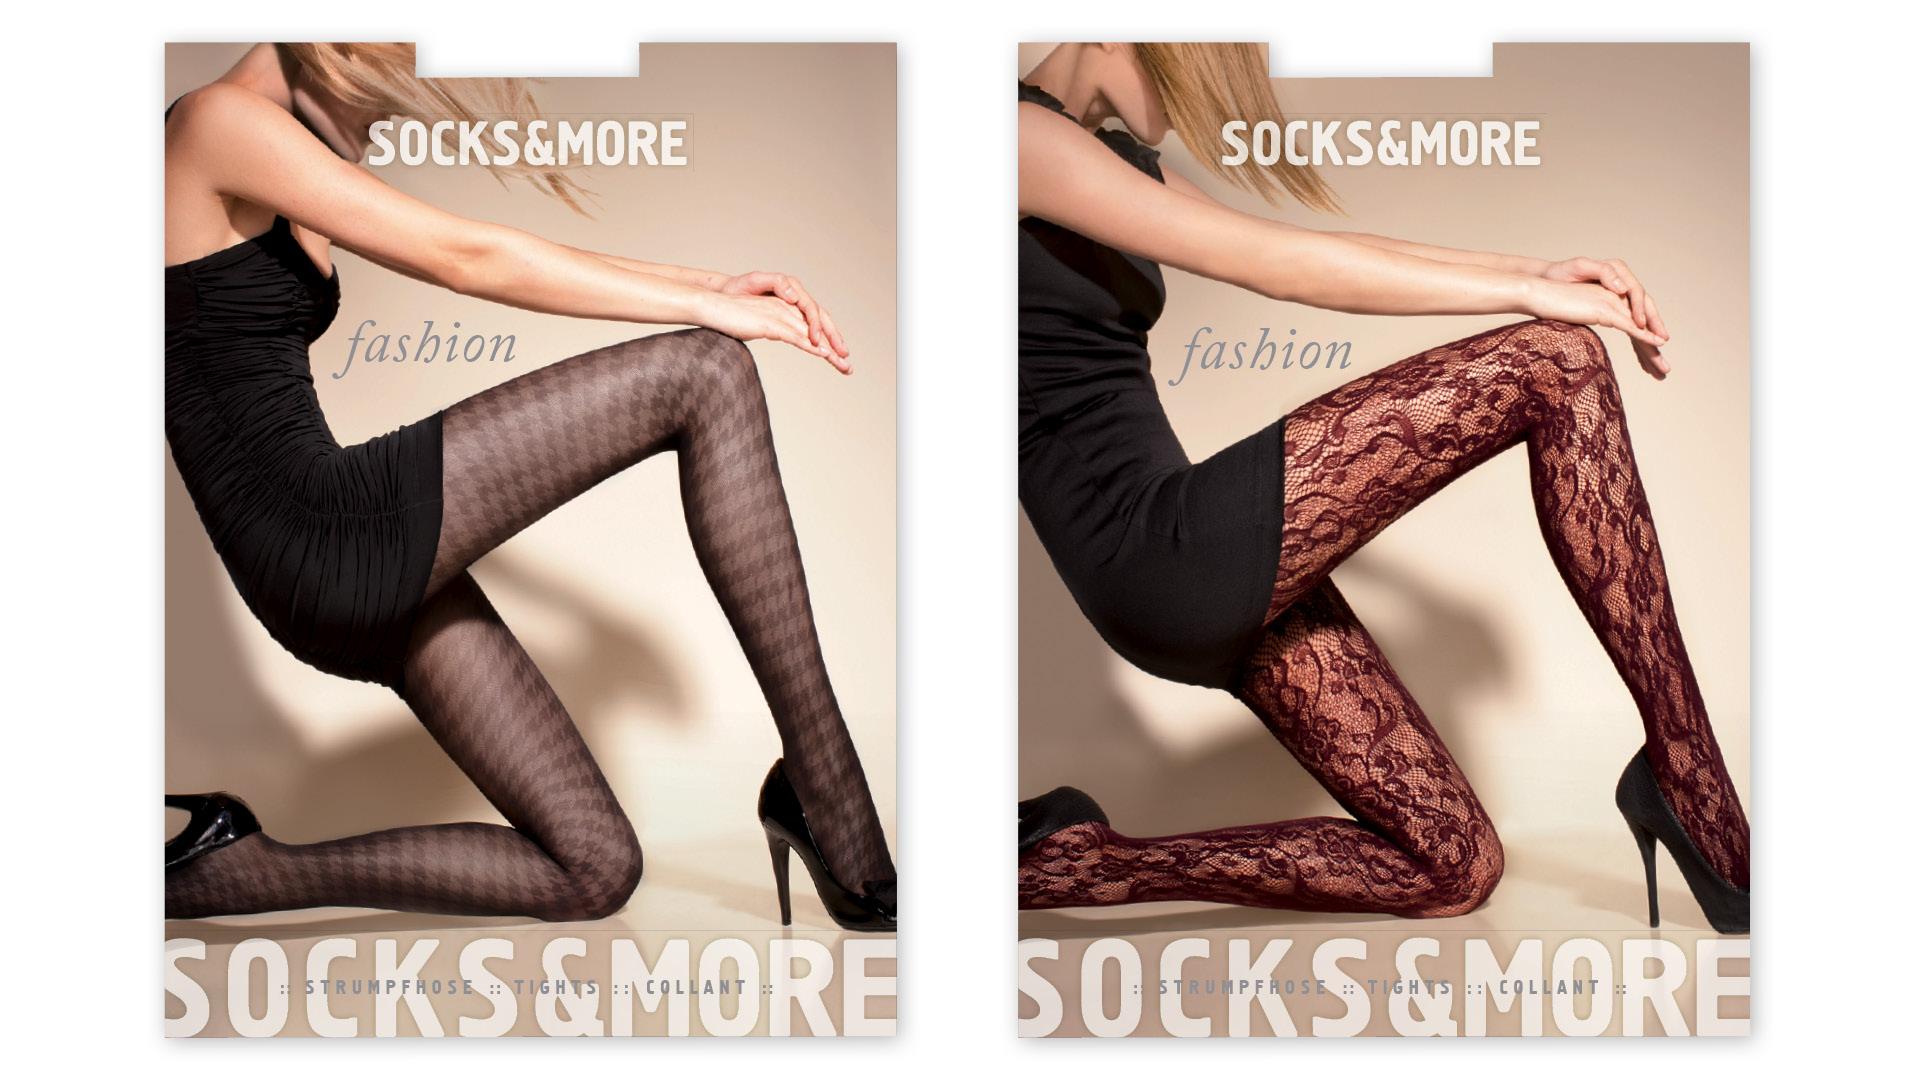 Socks & More Fashion Strumpfverpackungen